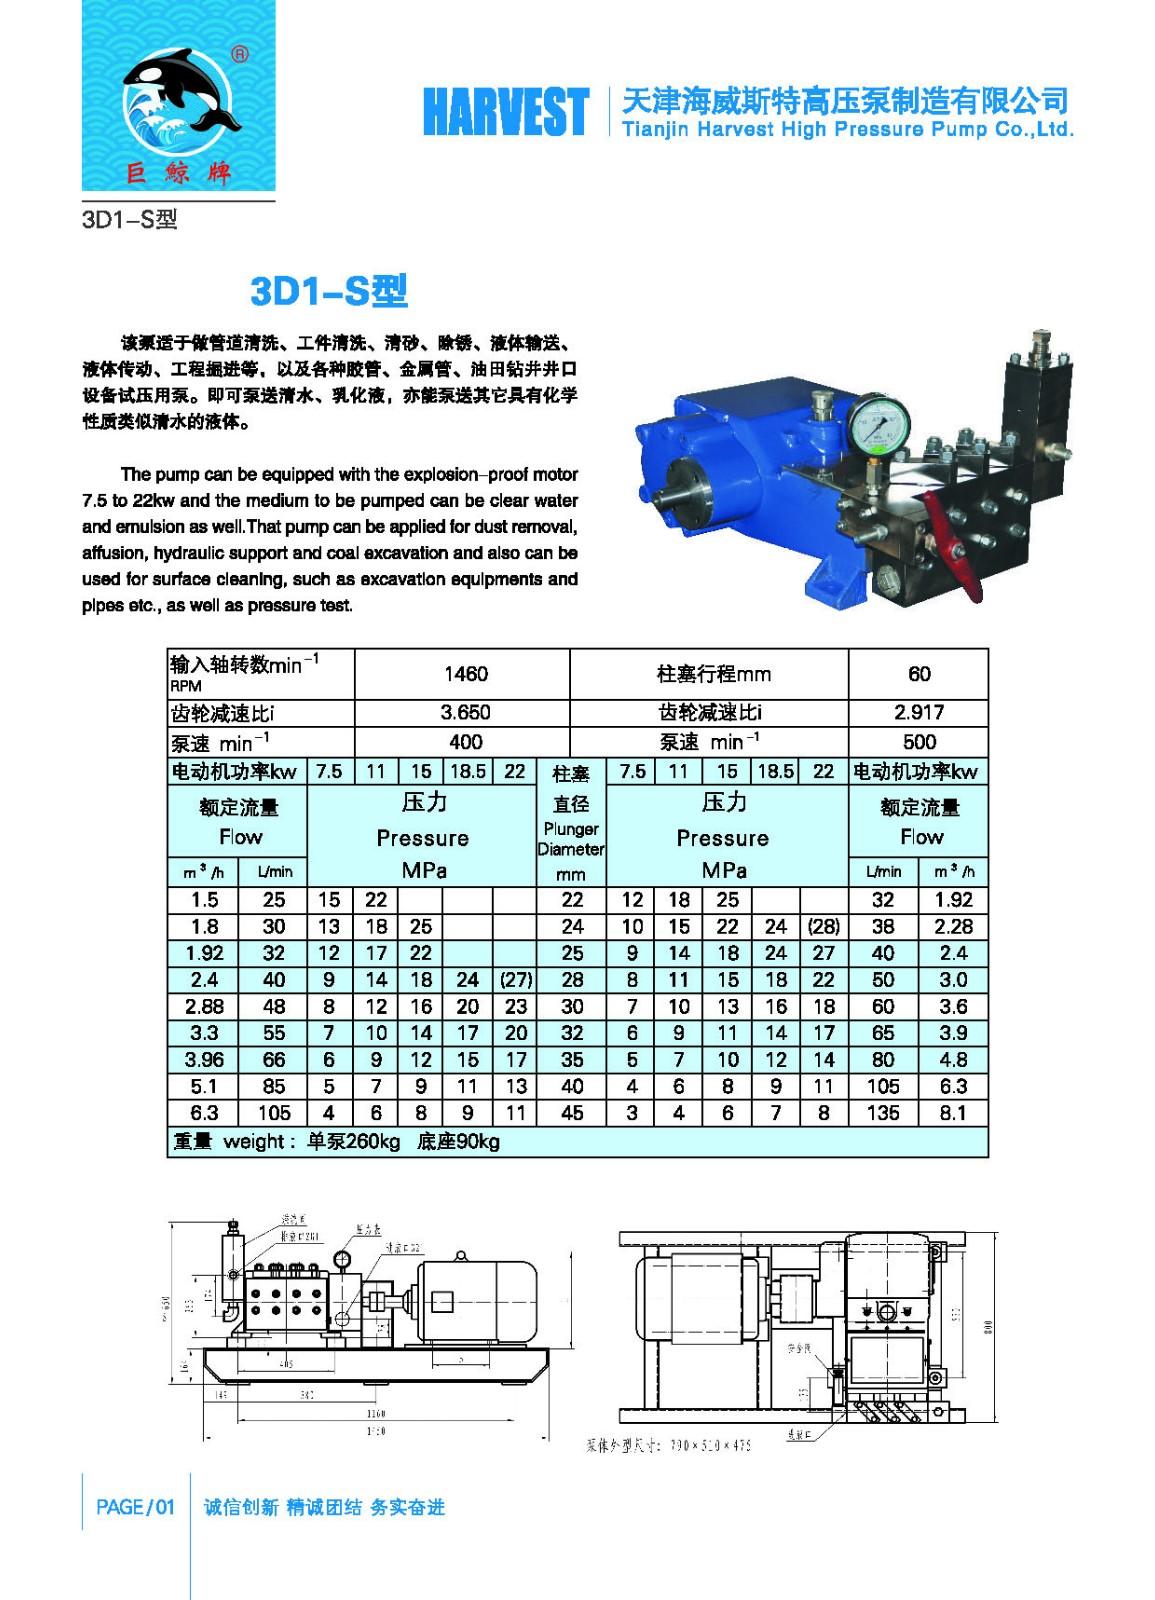 3D1-S.jpg